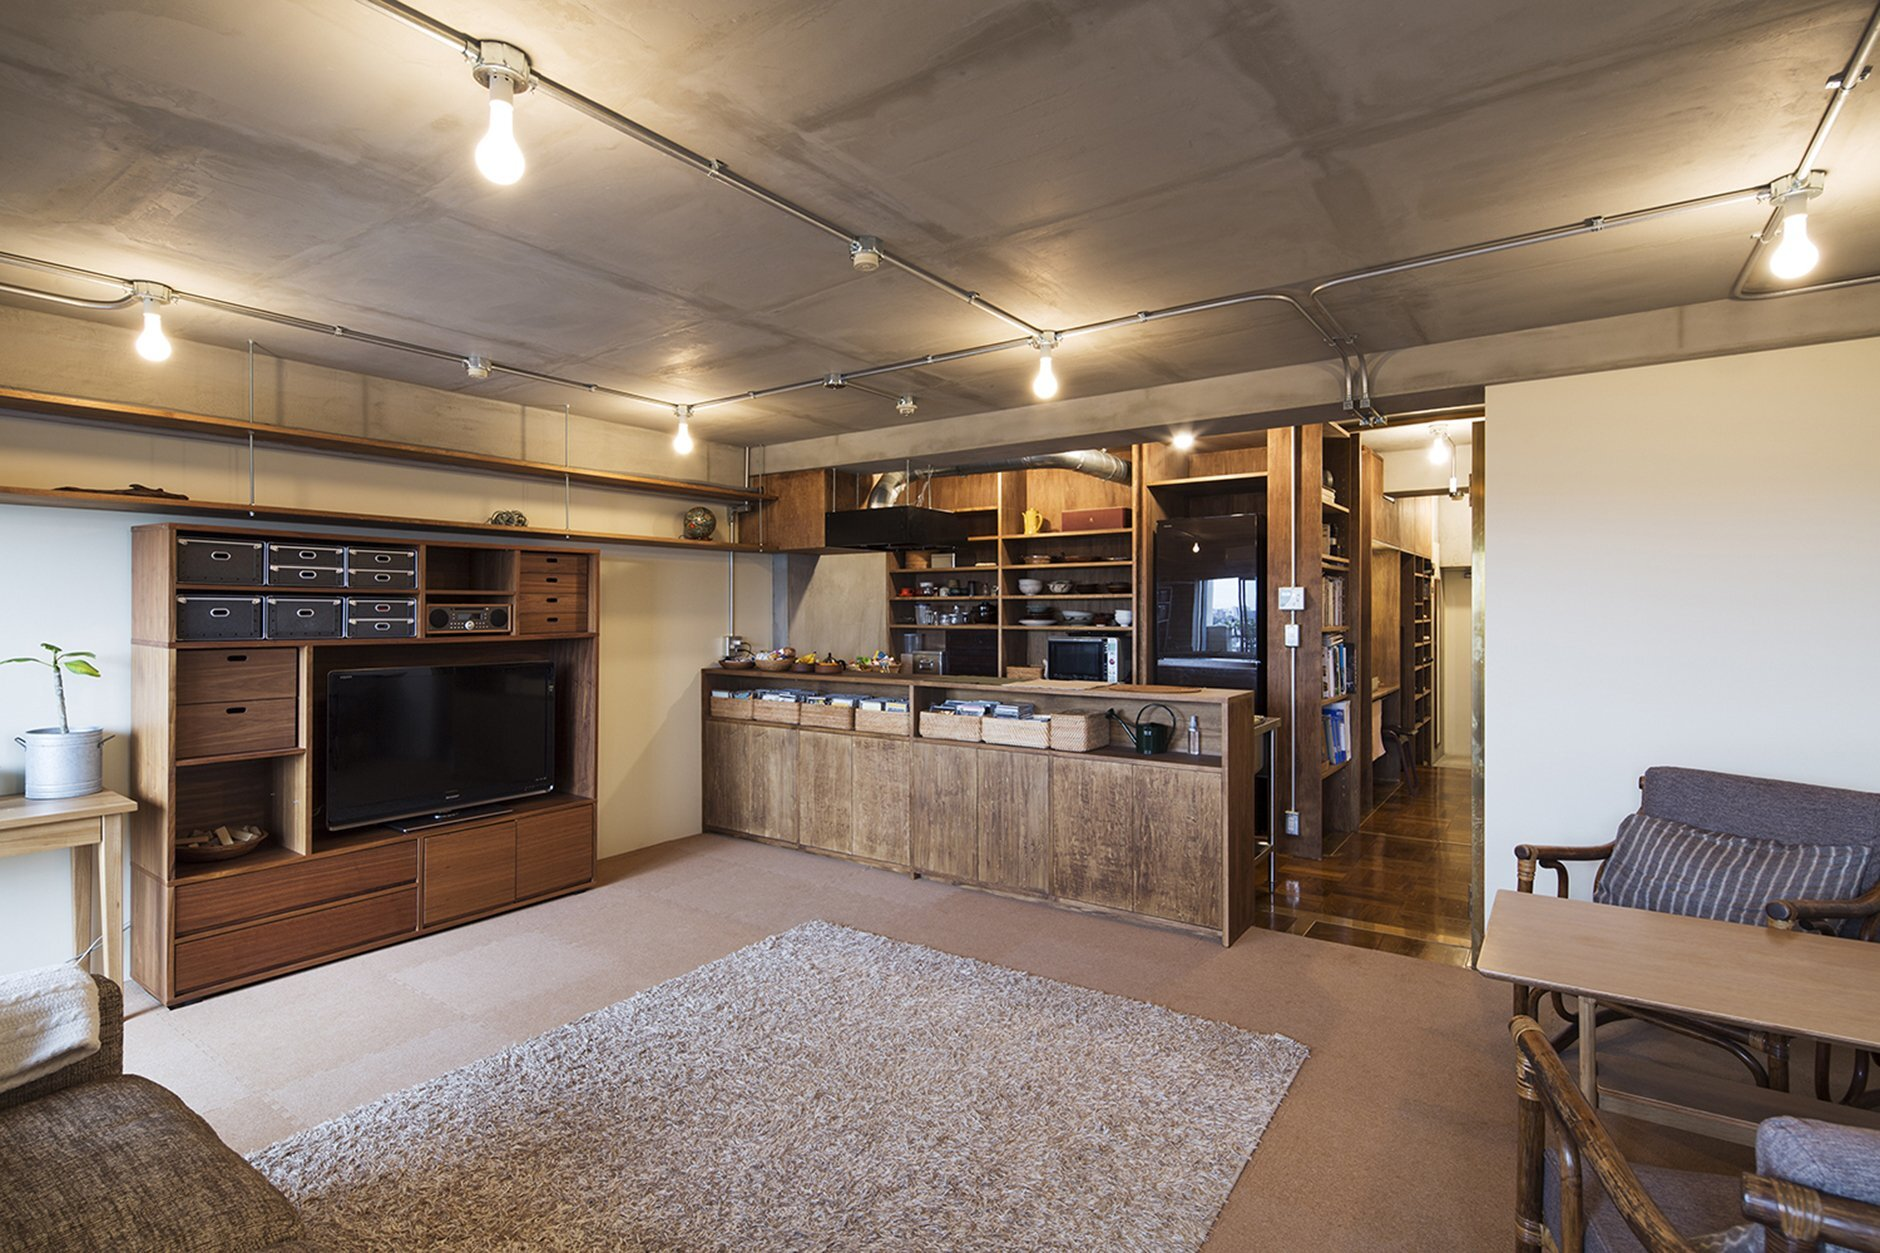 Gakugeidaigaku - Yuichi Yoshida & Associates - Japan - Living Area 2 - Humble Homes